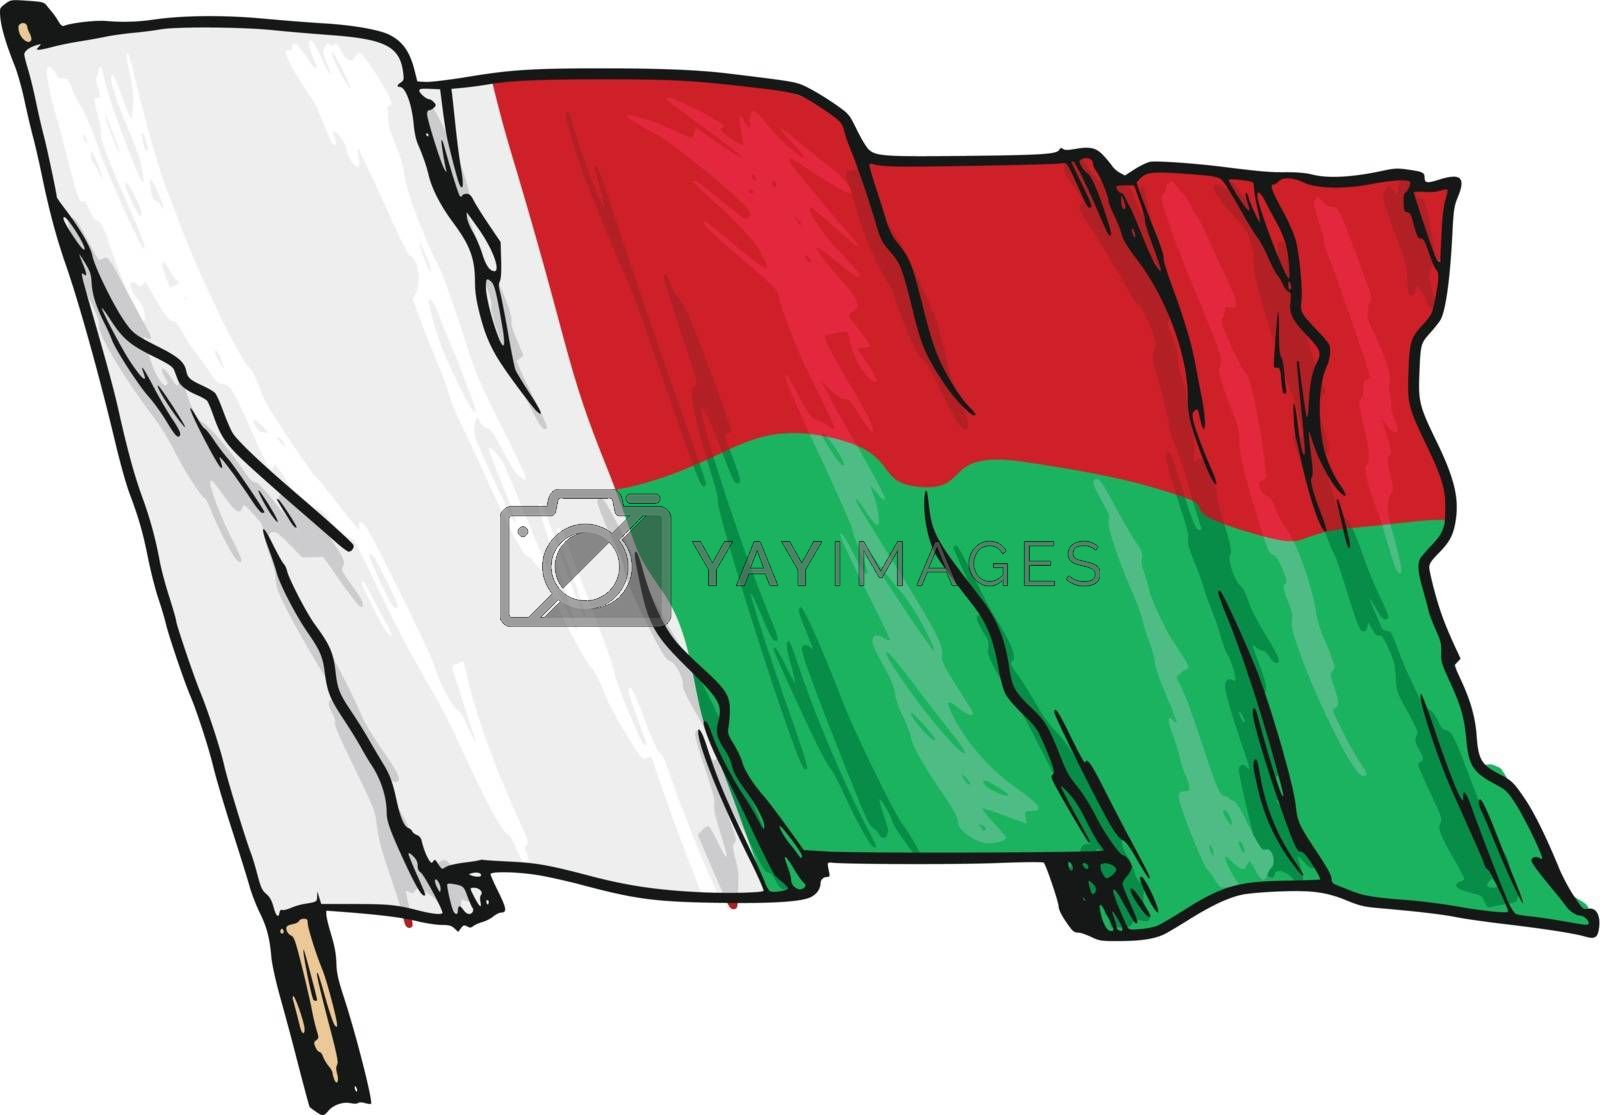 hand drawn, sketch, illustration of flag of Madagascar